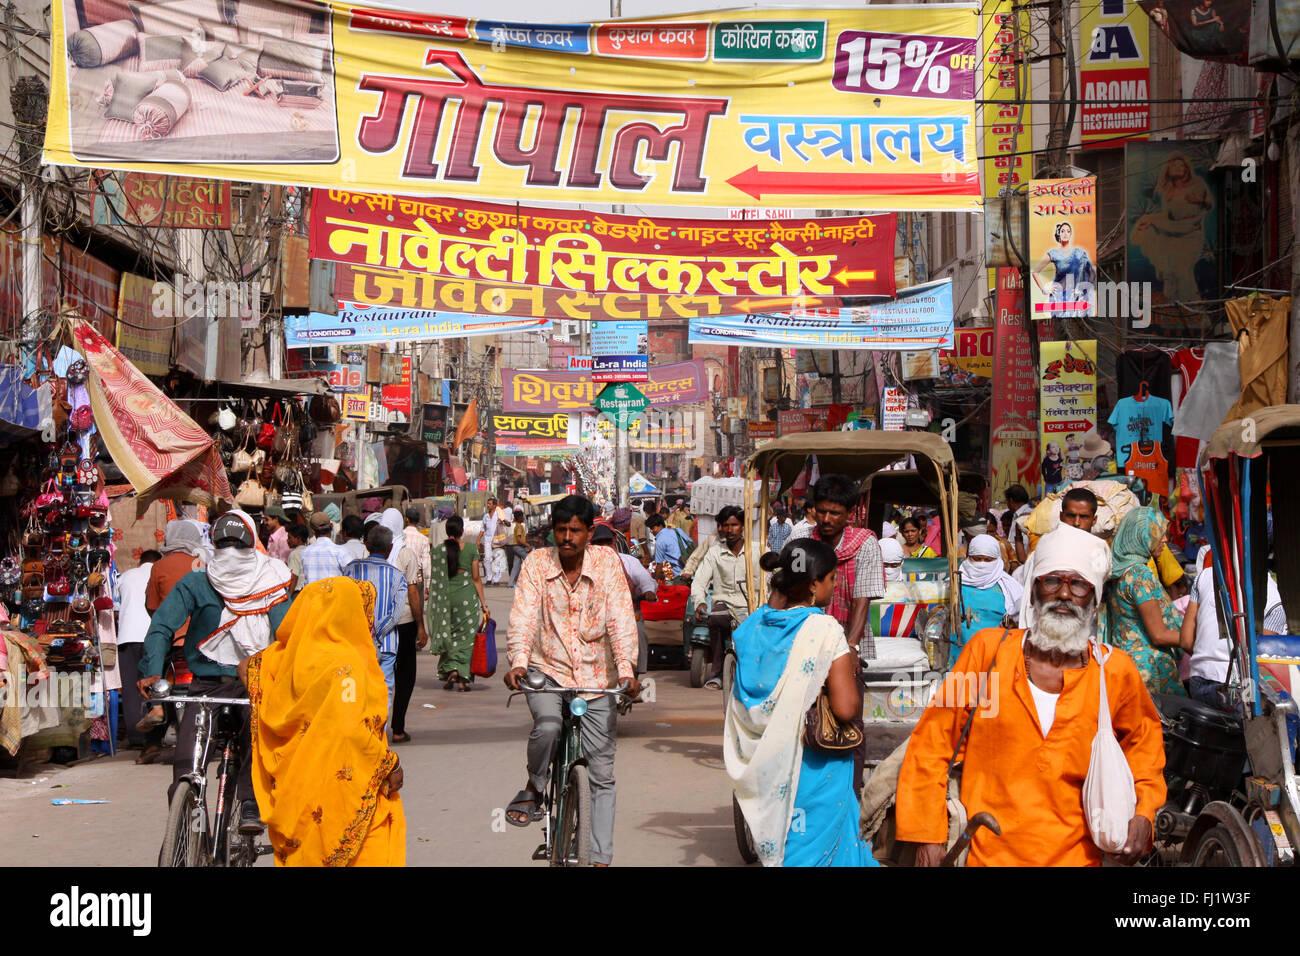 Chaos und Verkehr in Varanasi, Indien Stockbild